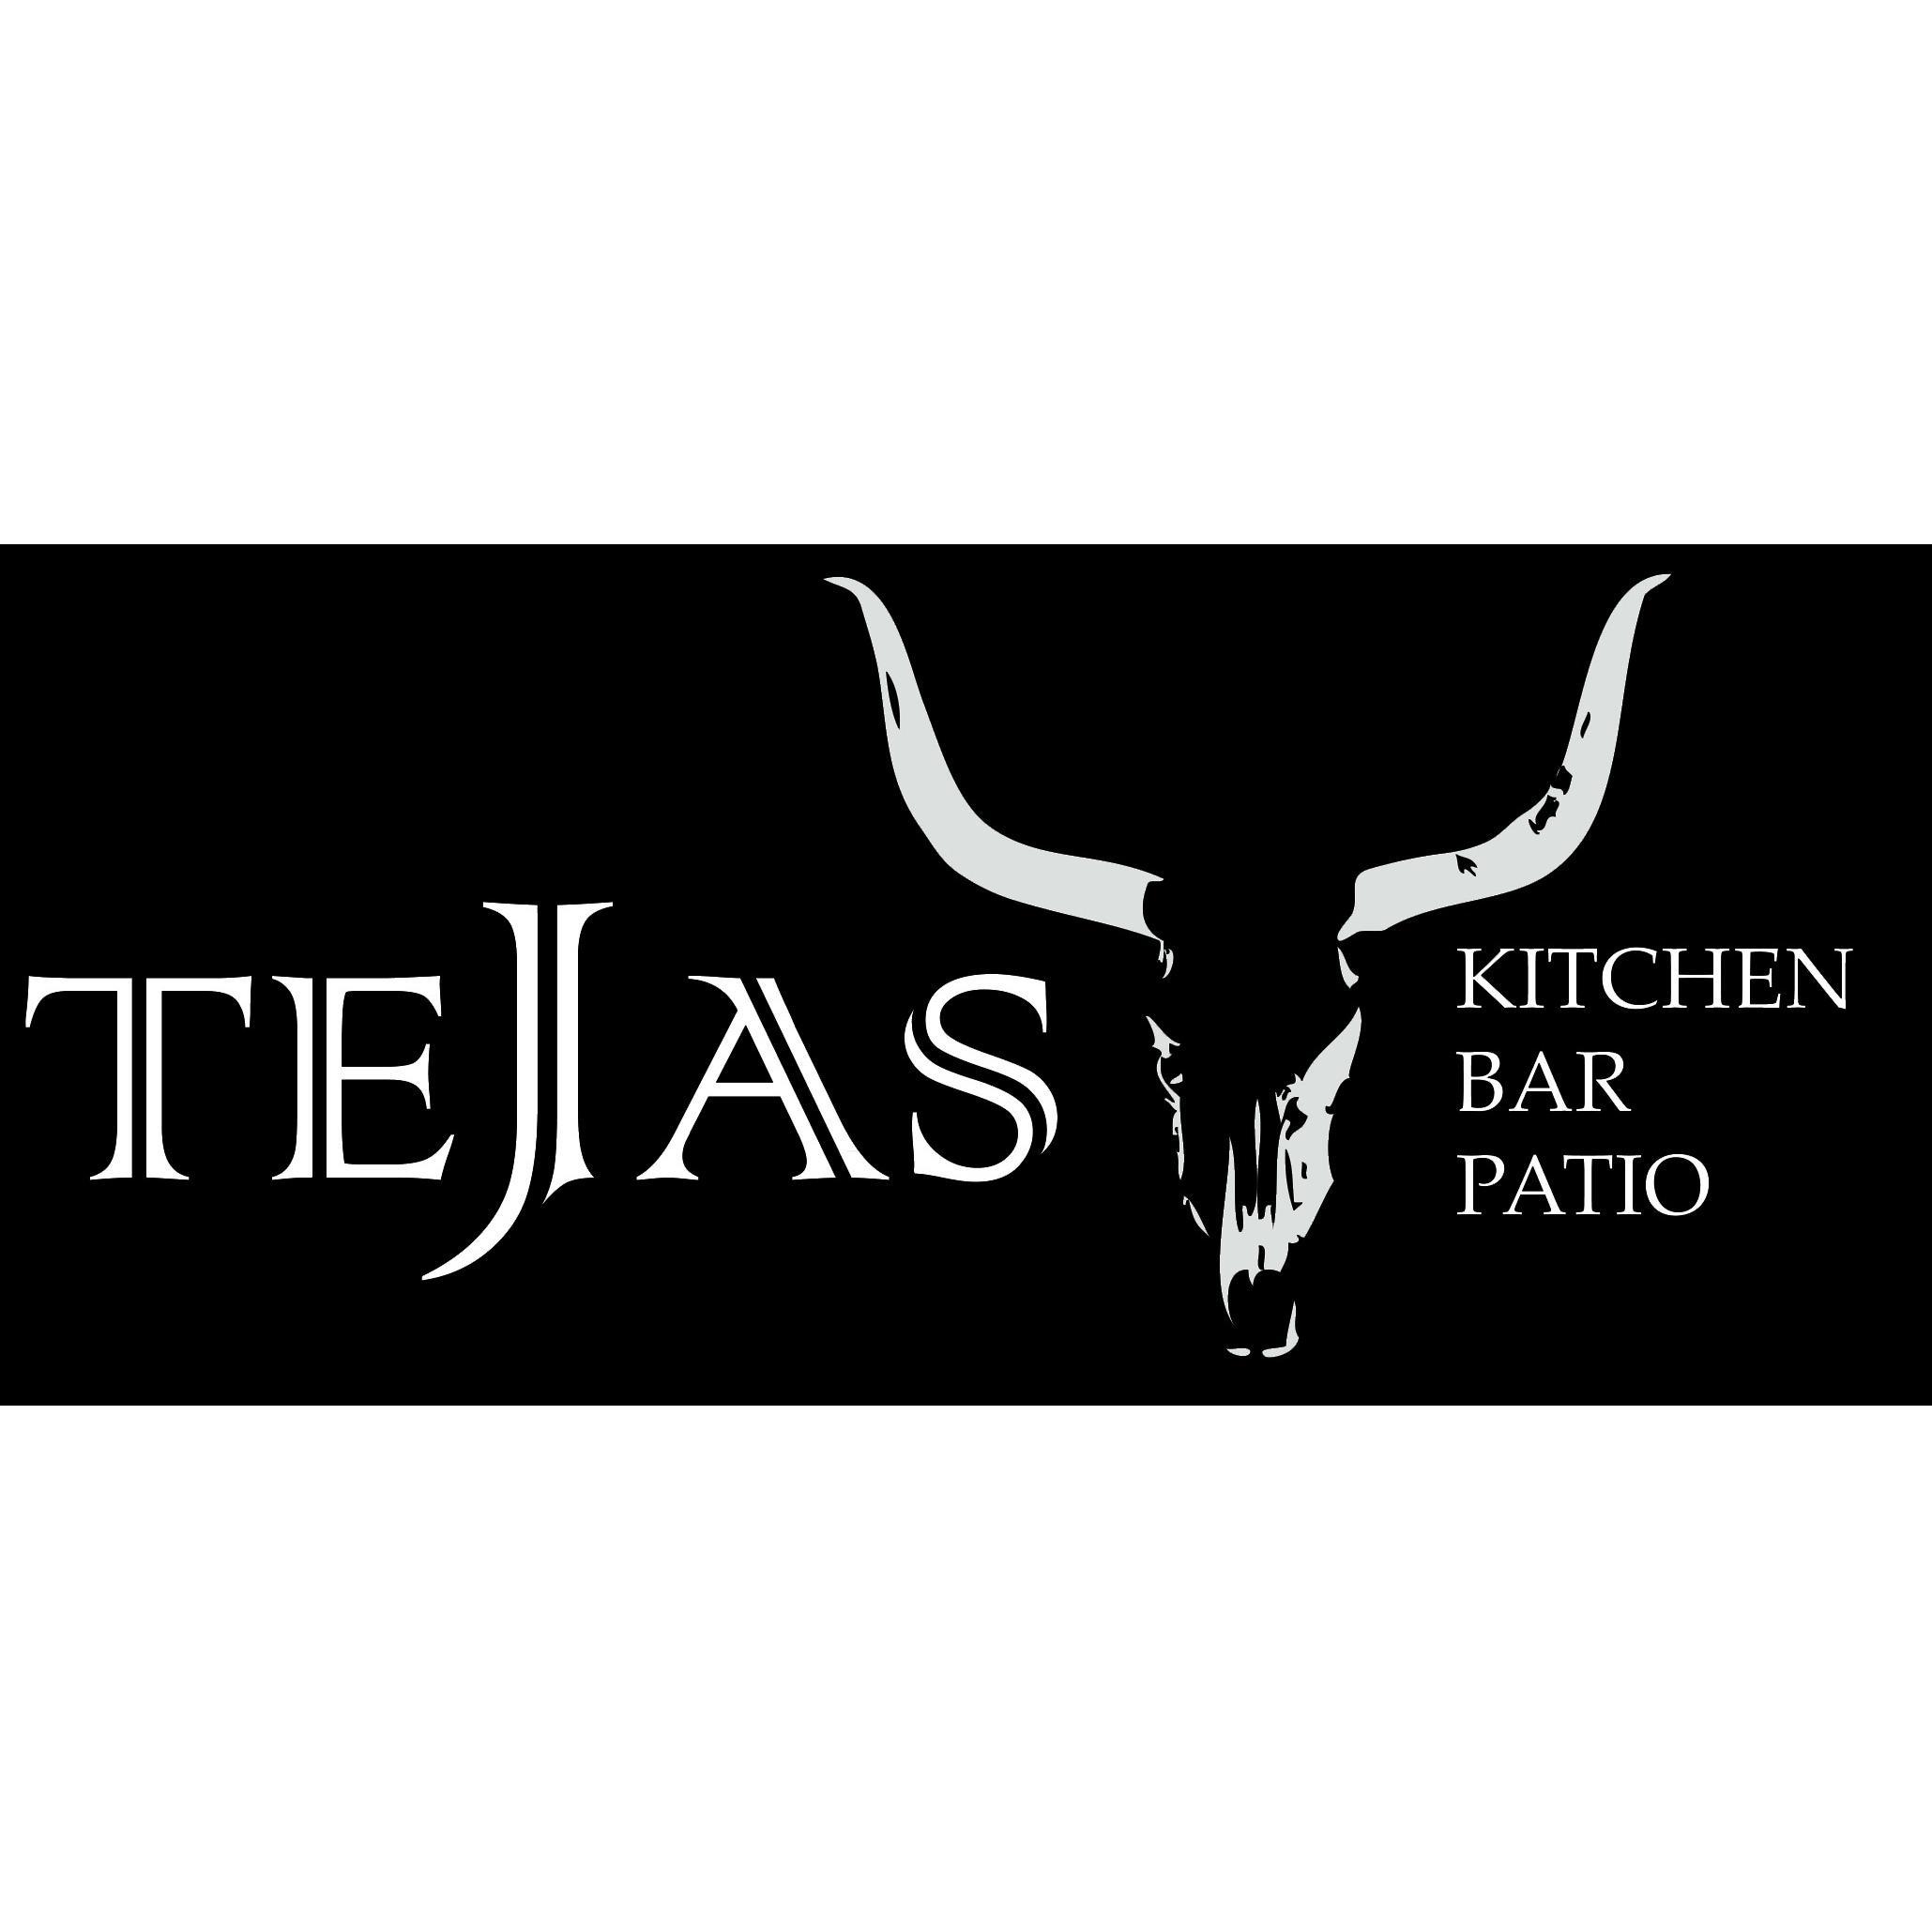 Tejas Kitchen Bar Patio